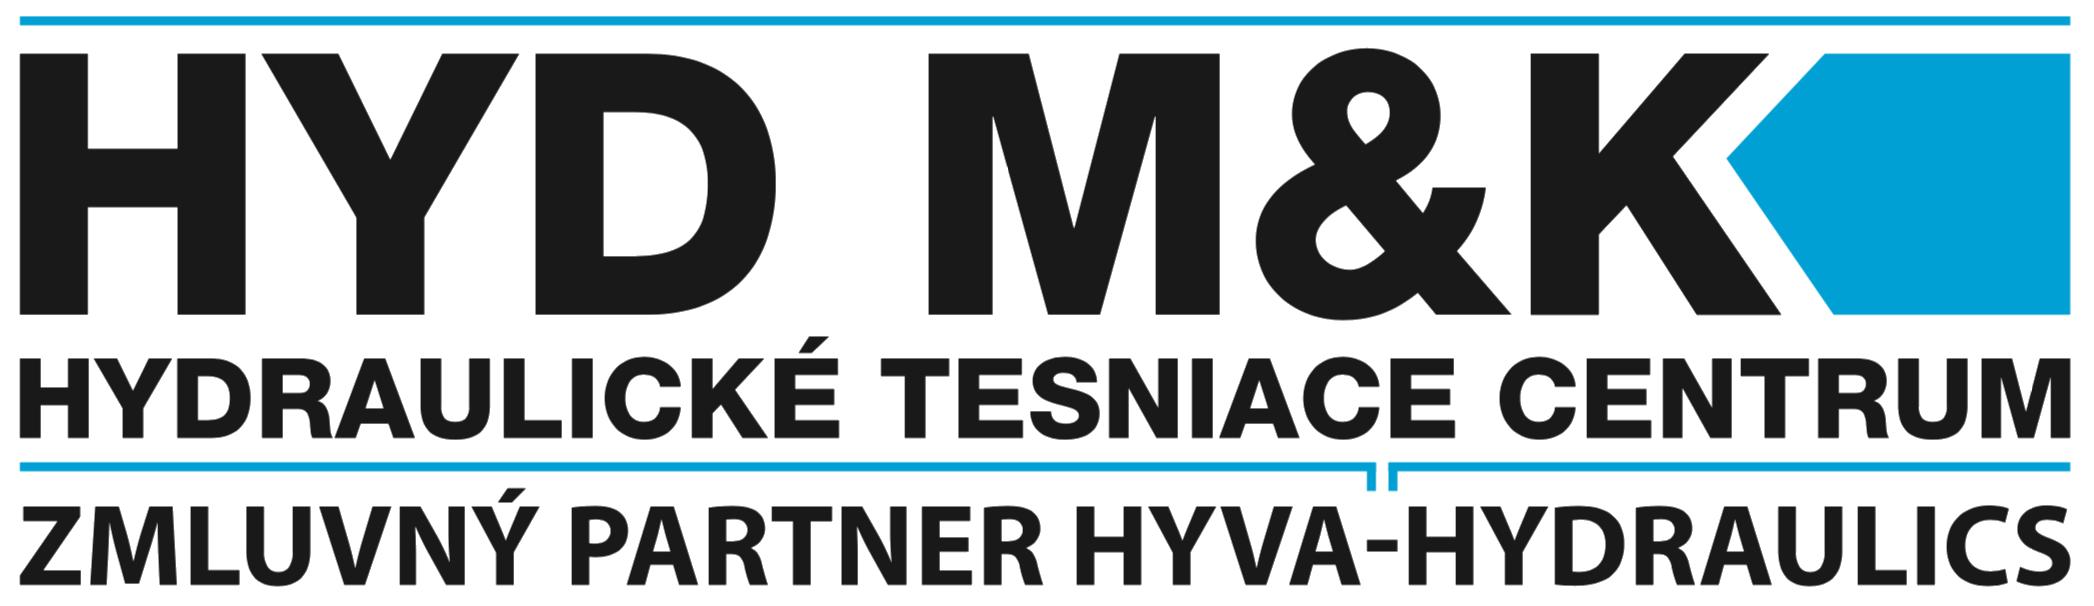 HYD M&K | Hydraulické tesniace centrum